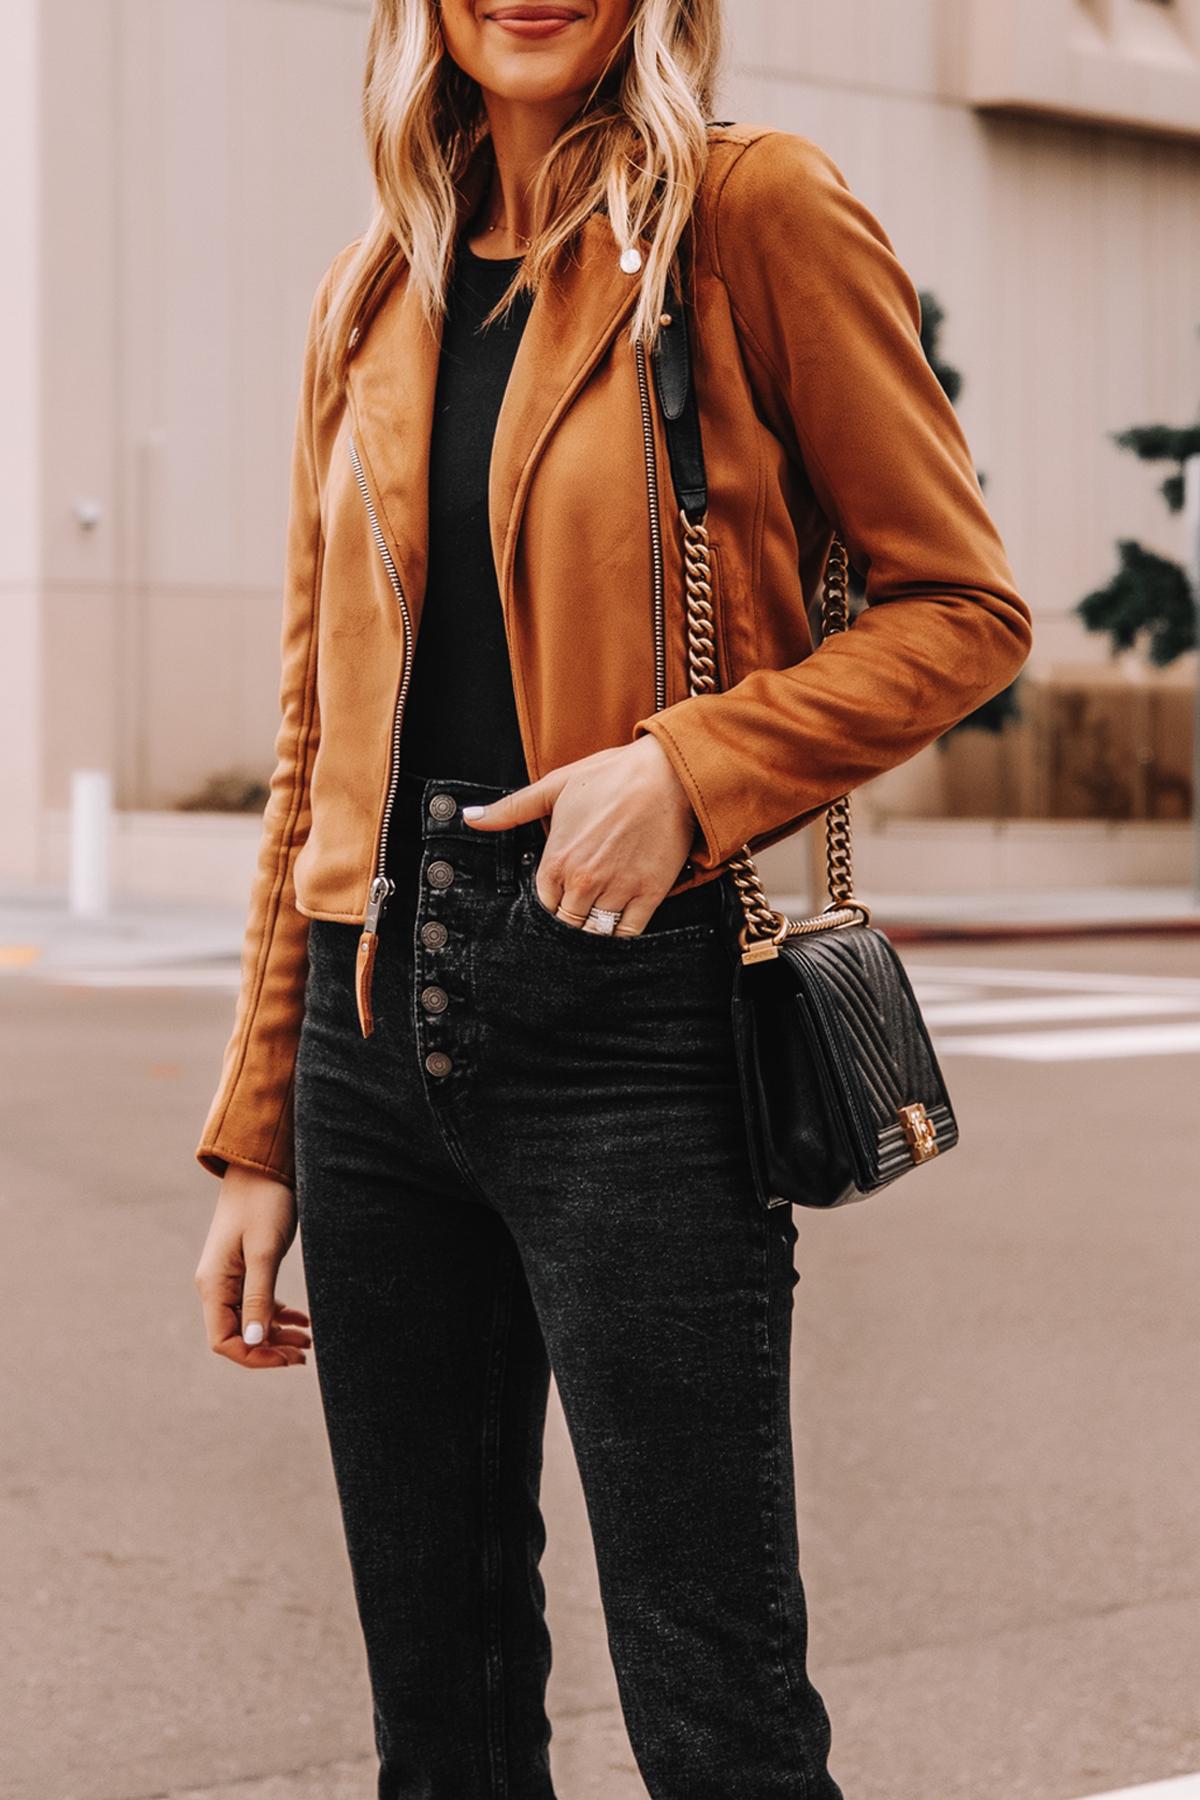 Fashion Jackson Wearing Abercrombie Tan Suede Moto Jacket Black Button Front Jeans 2